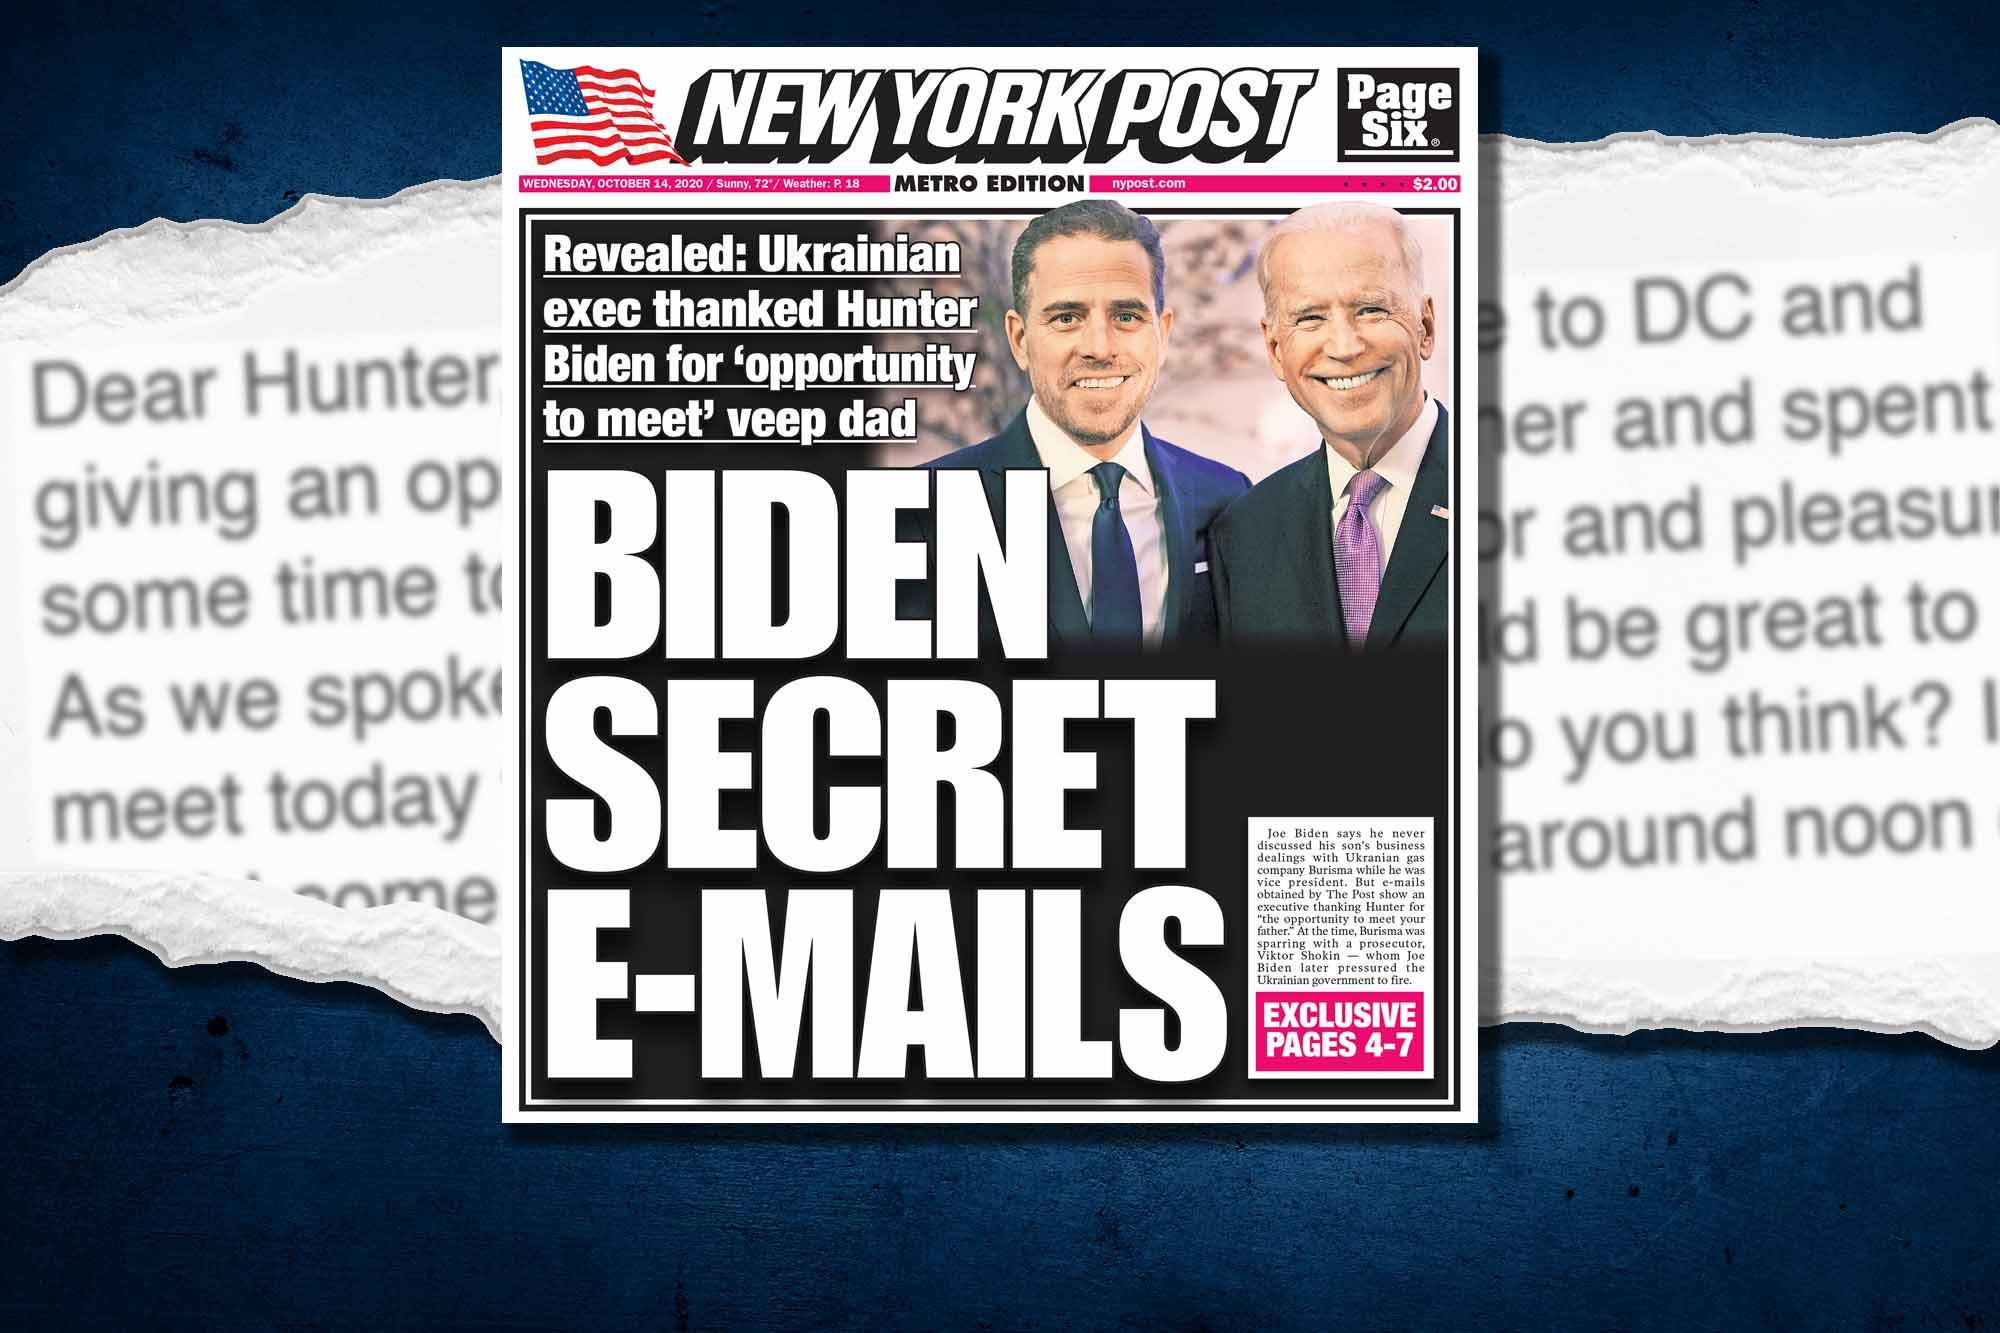 Red Pill News: JOE BIDEN LIED! – Hunter Biden Emails Released!